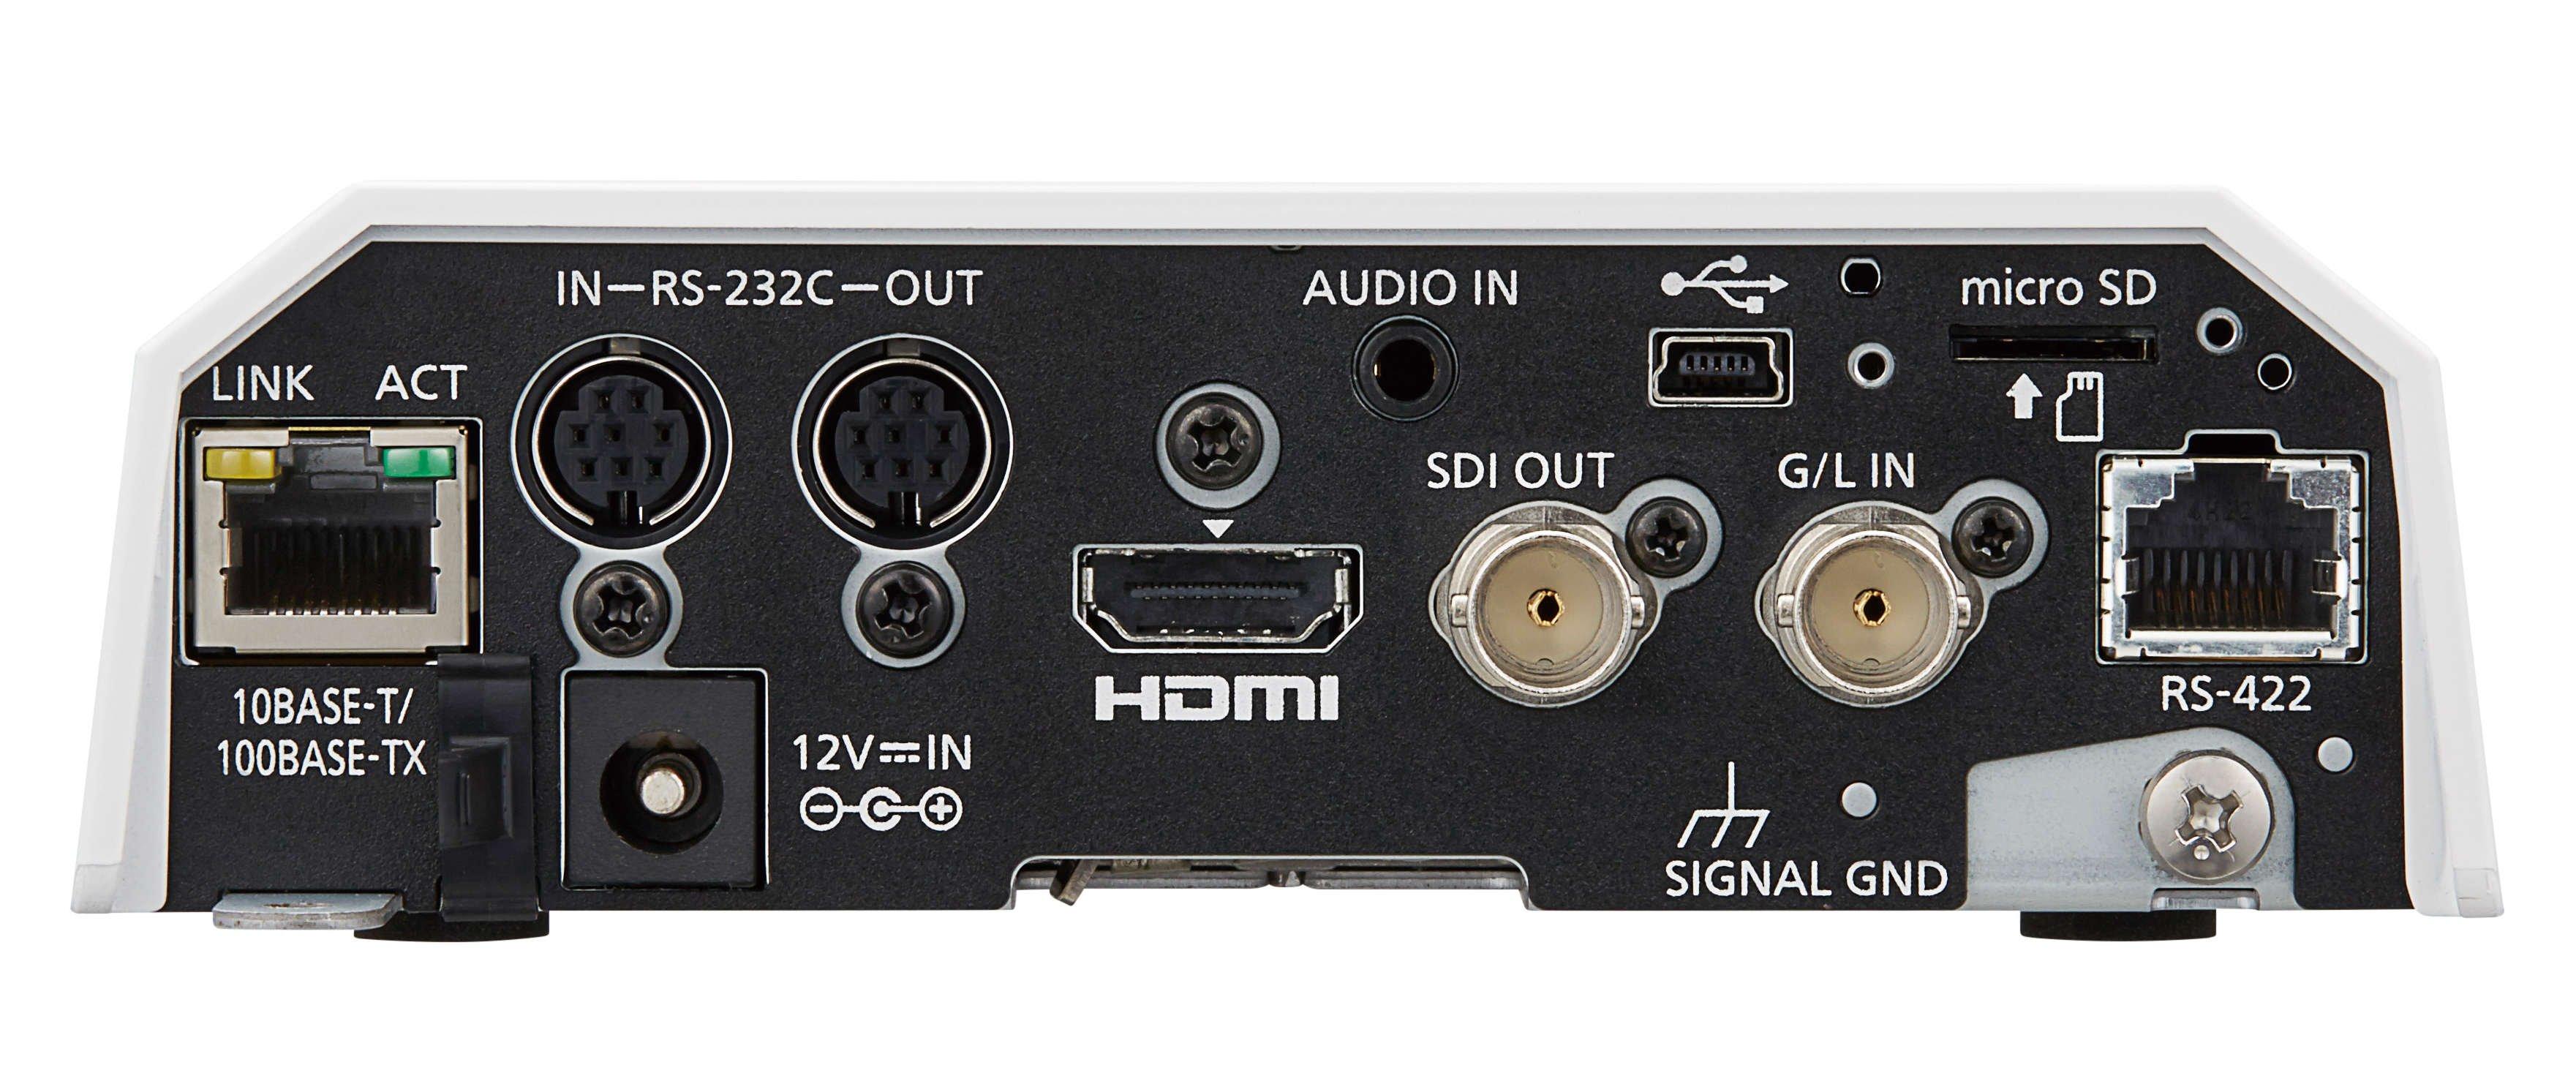 Black 4K Camera, 22x PTZ with HDMI